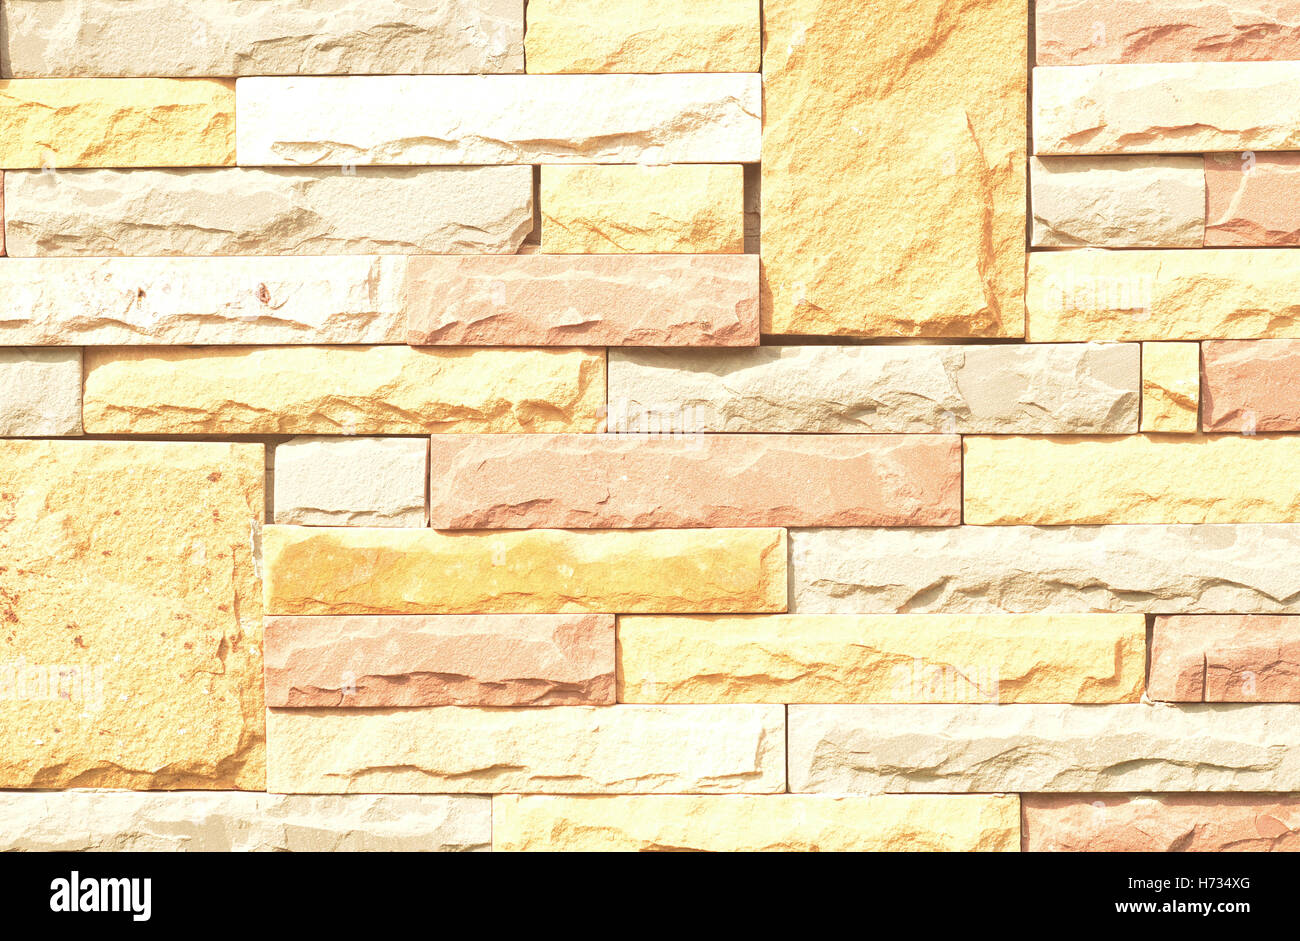 Slate Stone Wall Stock Photos & Slate Stone Wall Stock Images - Alamy